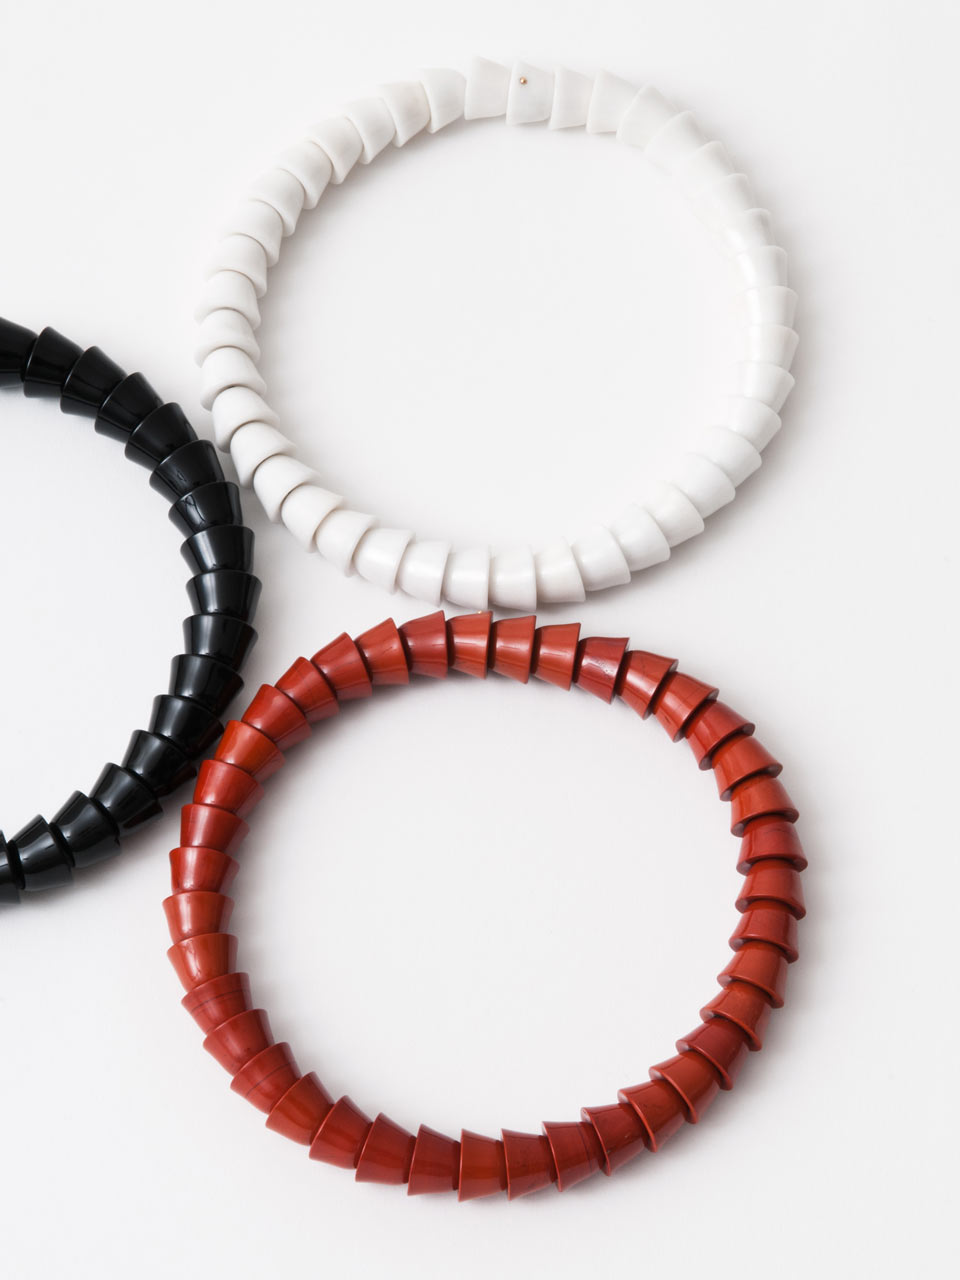 Perles-Necklace-Ronan-Erwan-Bouroullec-3